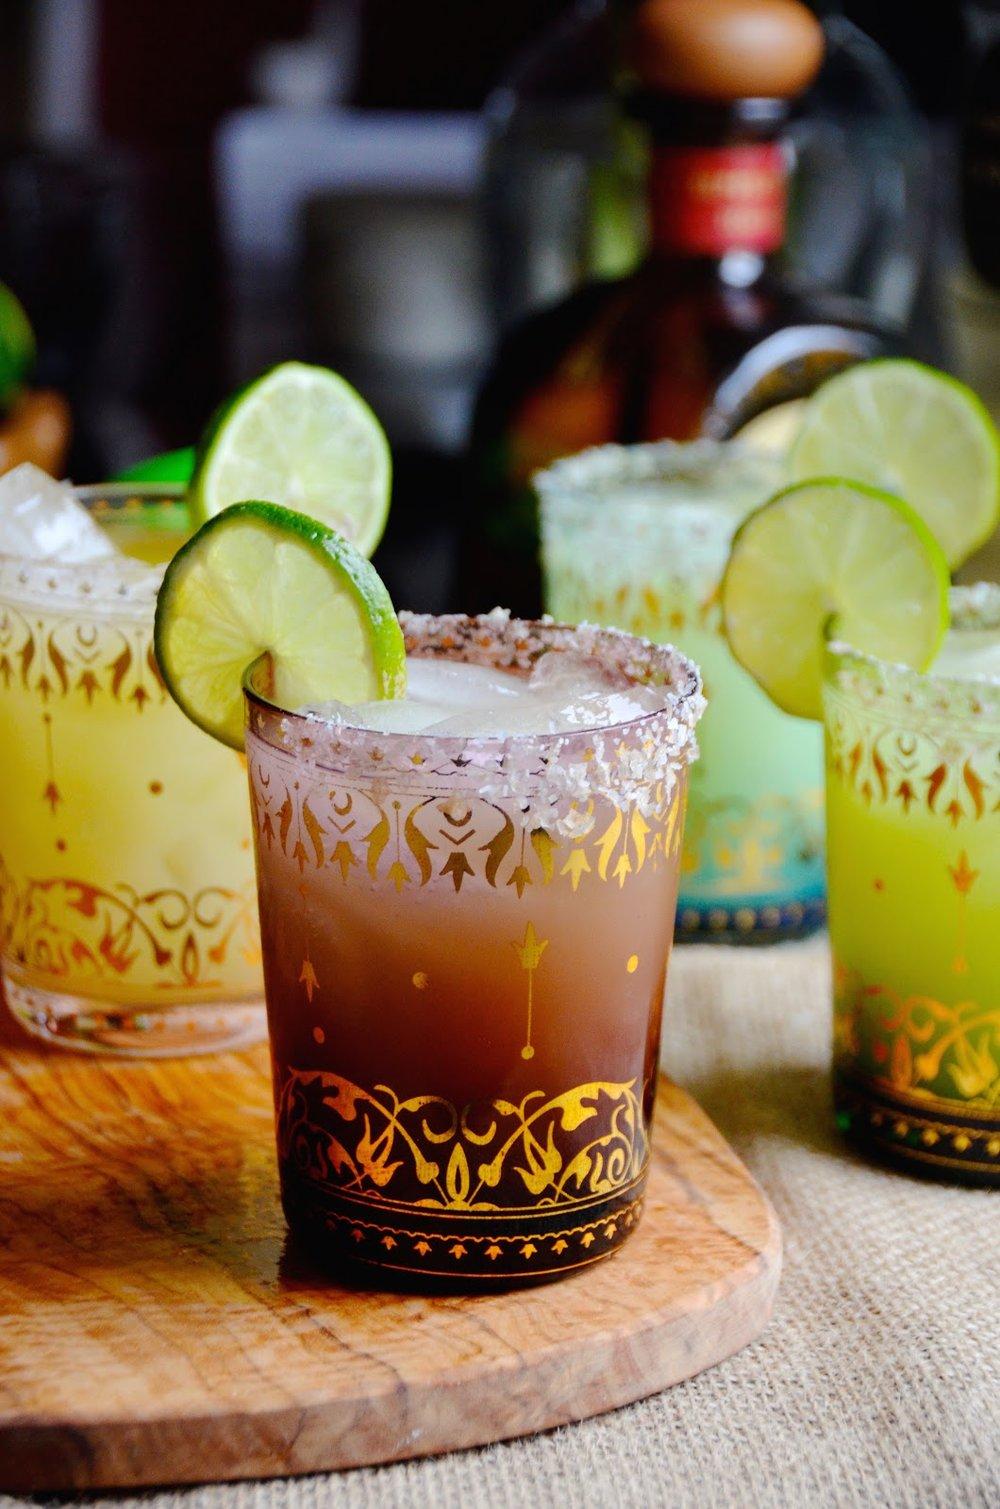 Photo by Alejandra Ramos. Alejandra is a TV food & lifestyle expert, blogger & recipe developer.